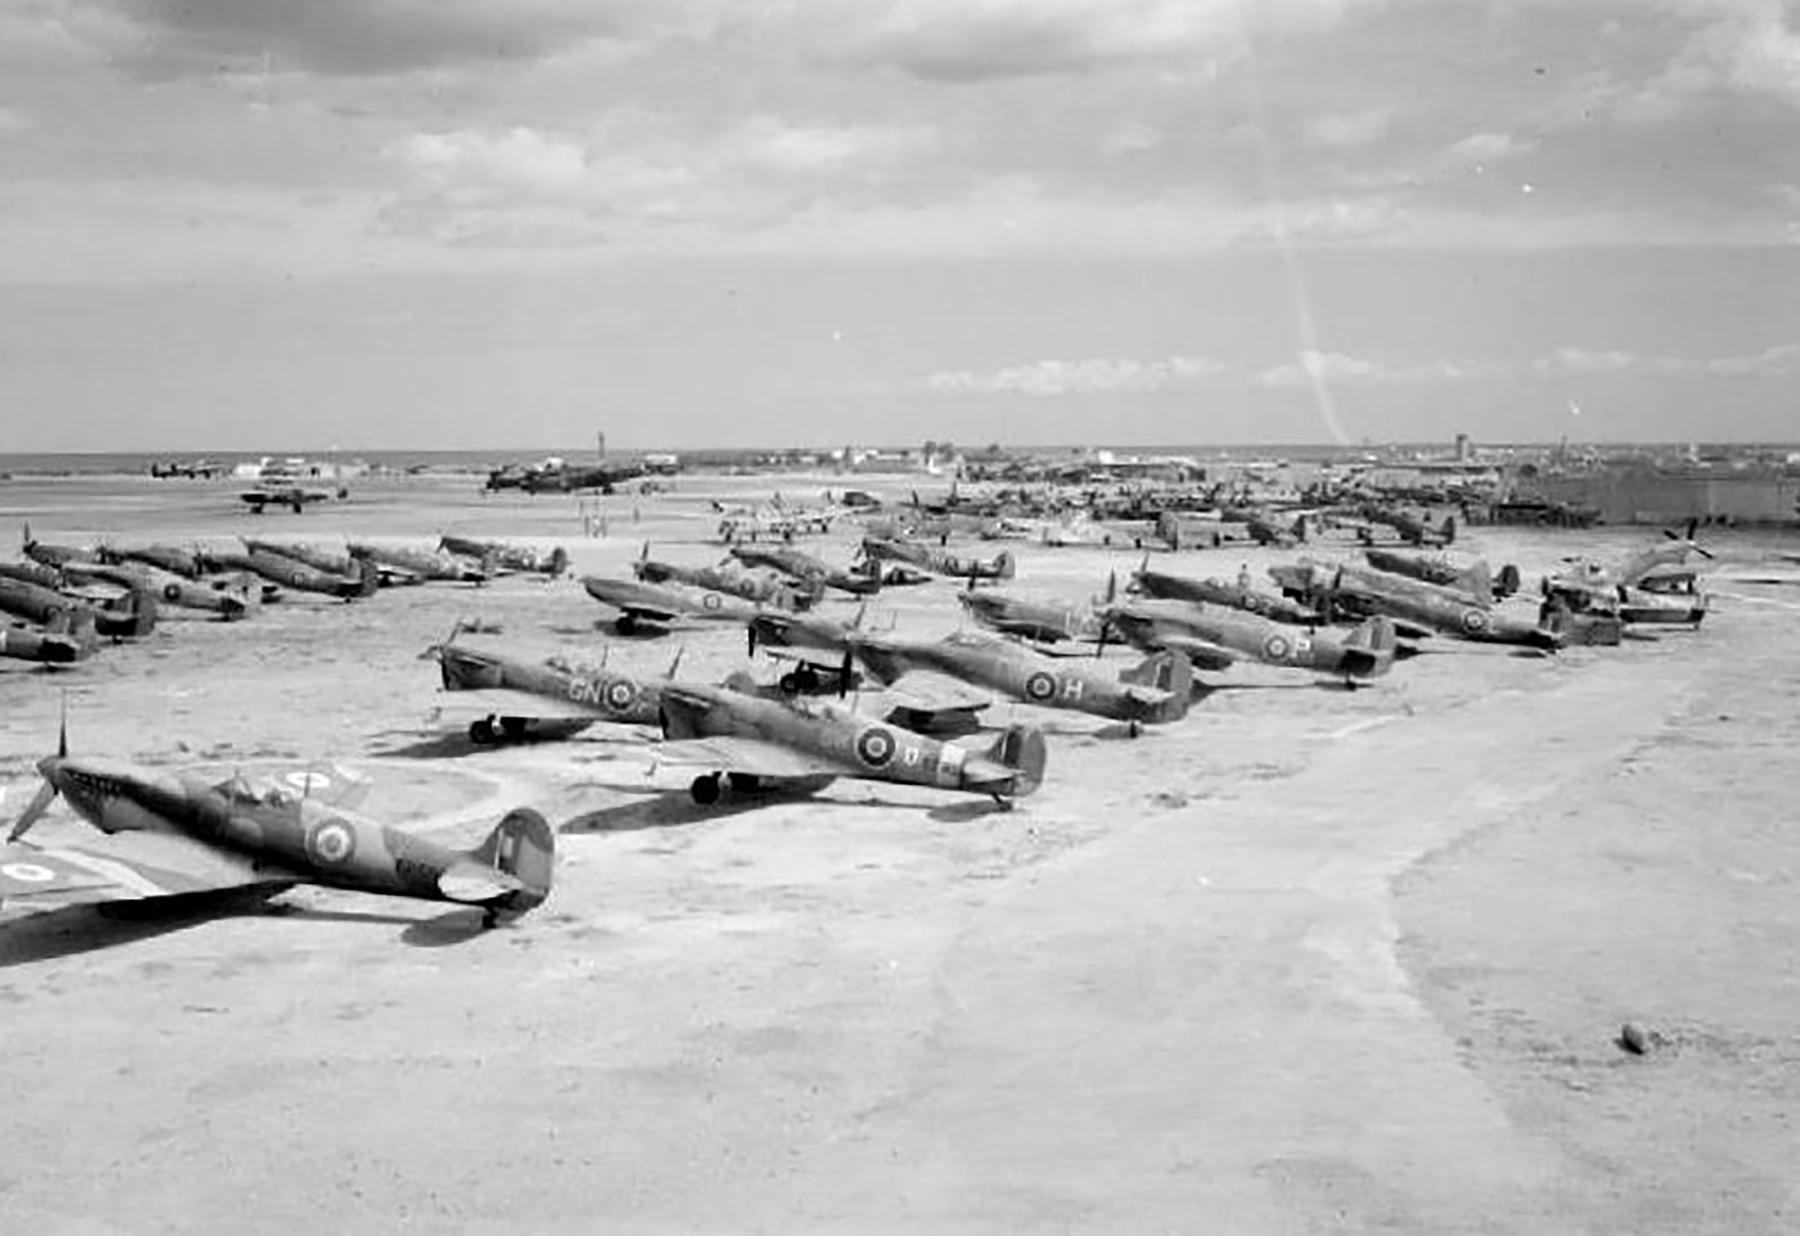 RAF 110 Maintenance Unit Brindisi Italy 01